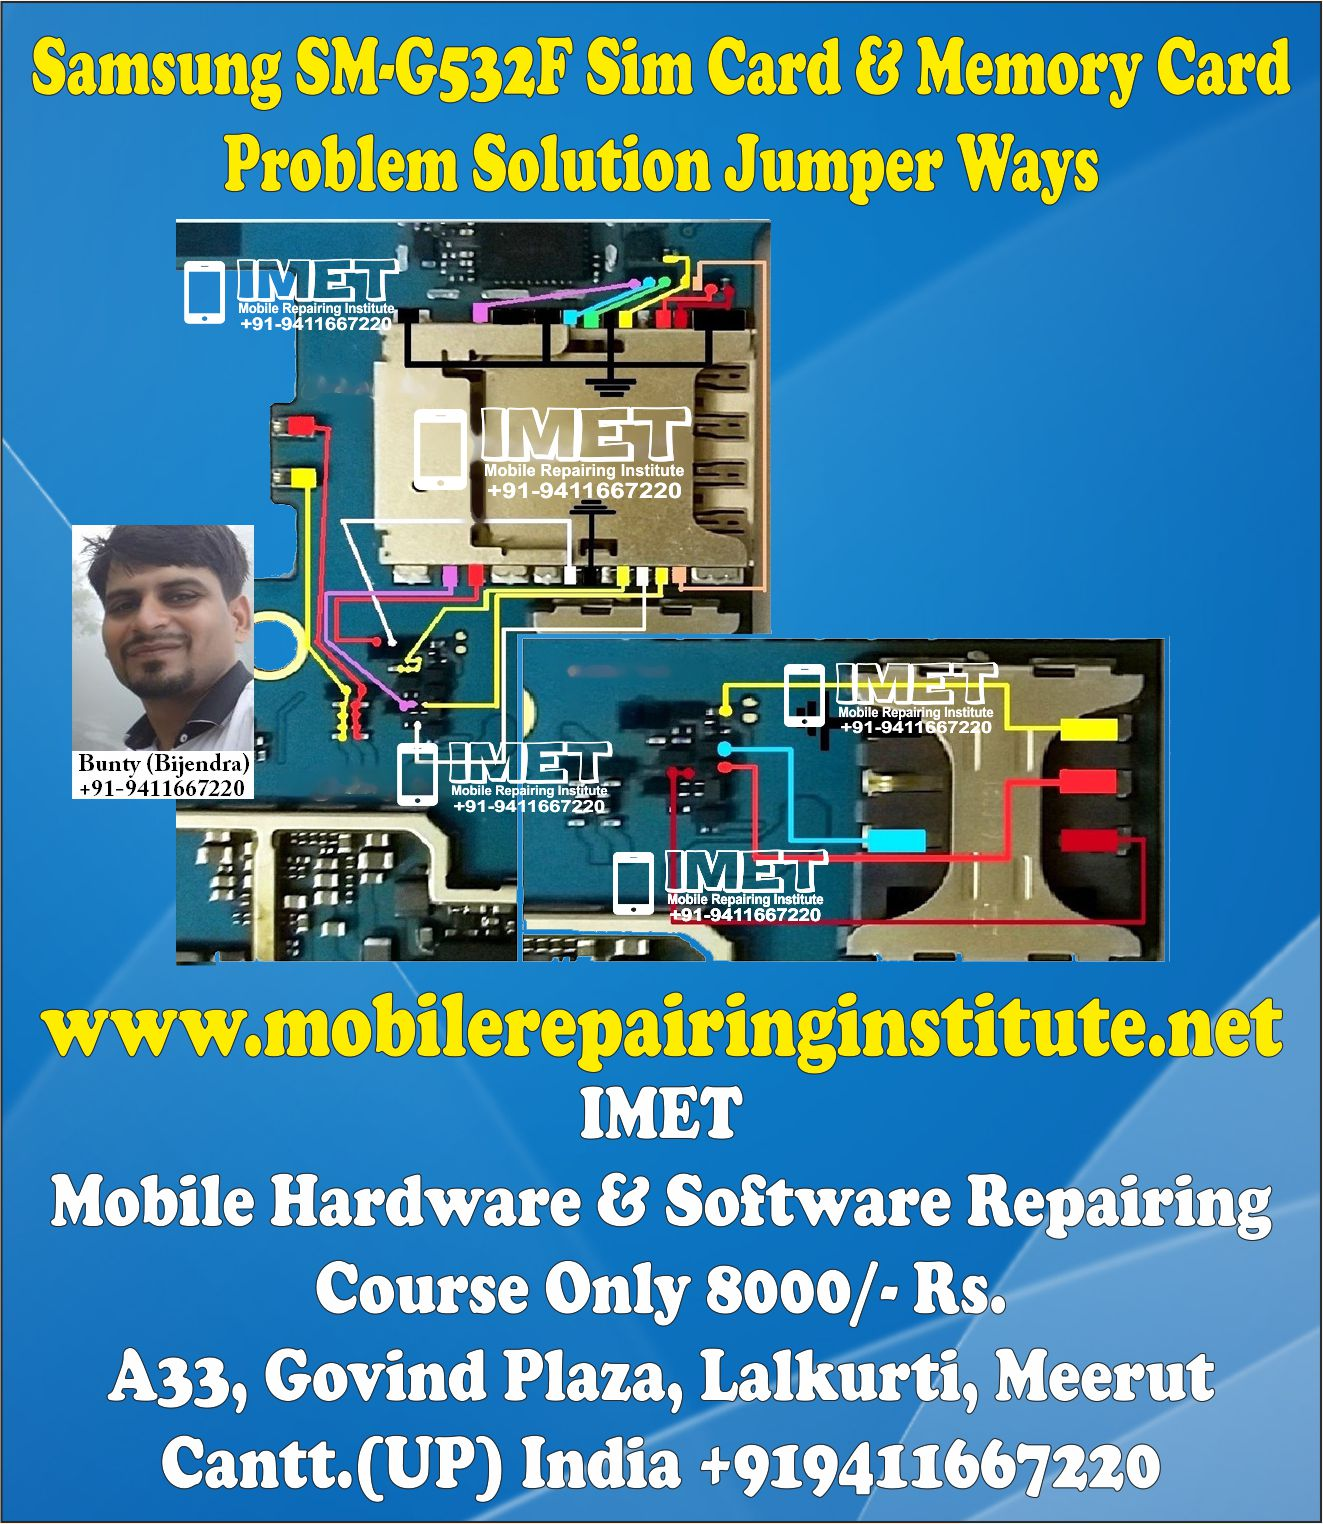 Samsung SM-G532F Sim Card & Memory Card Problem Solution